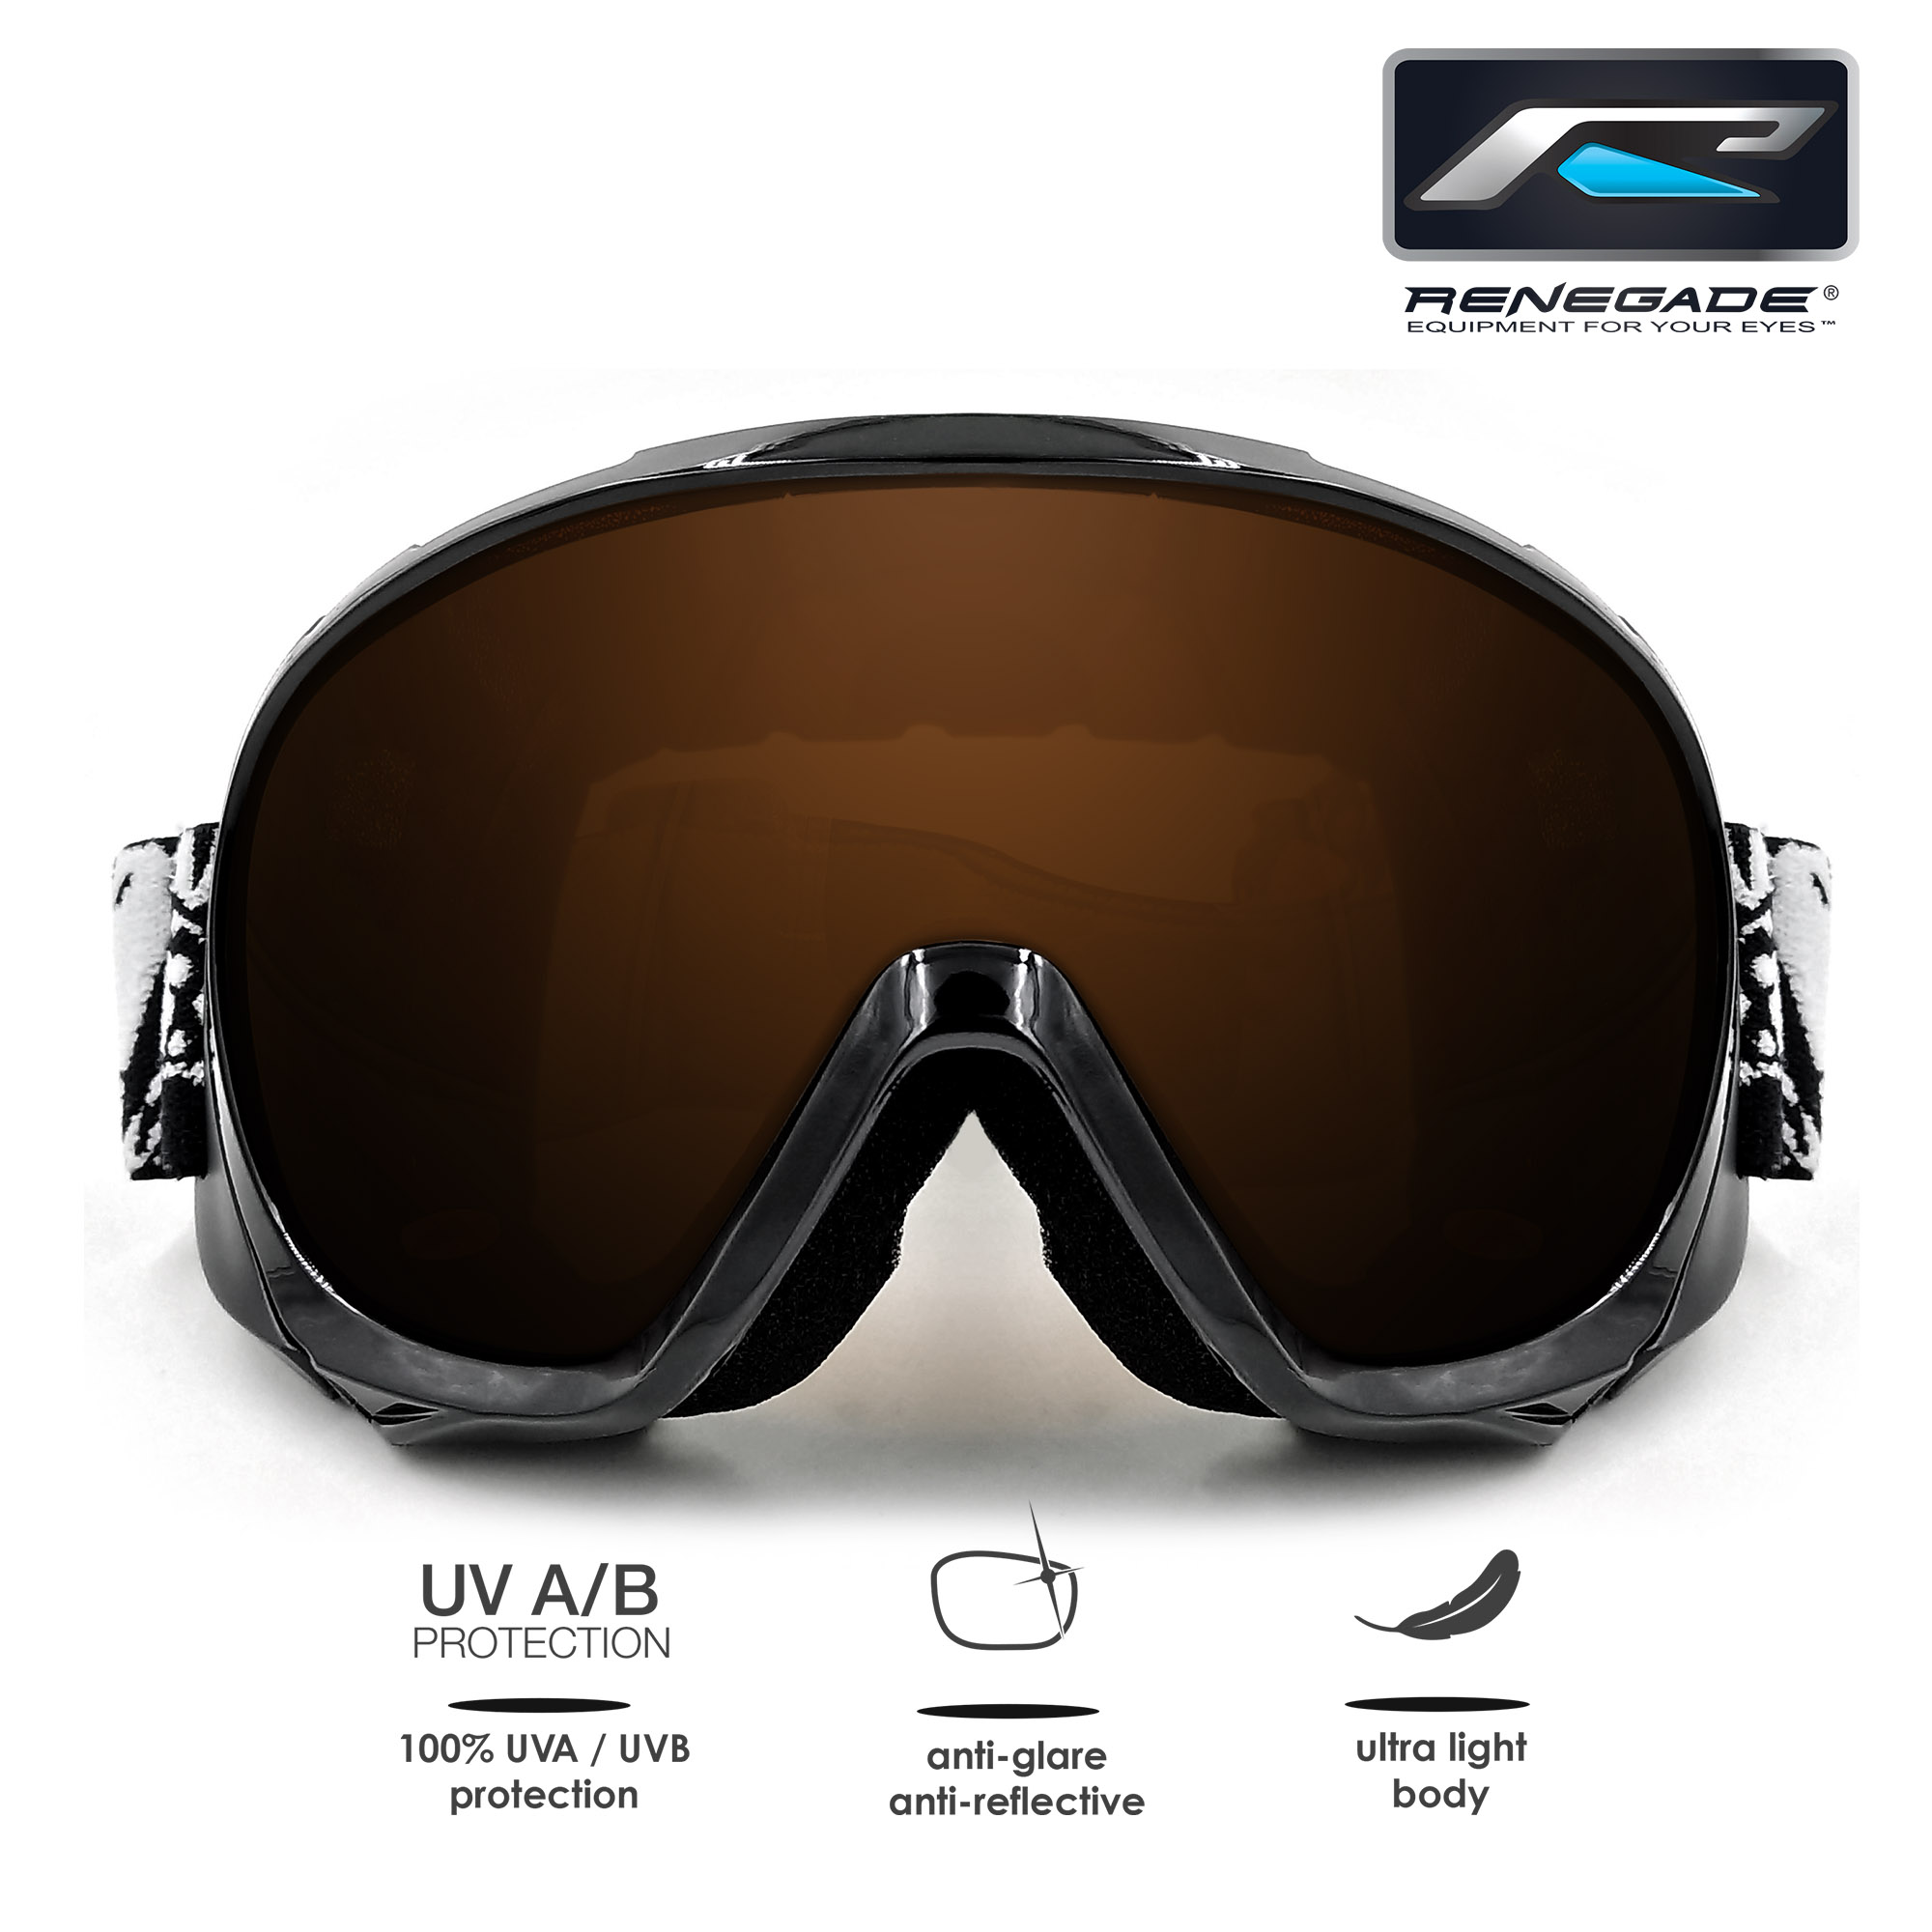 Renegade Rski-Lg16 Ski Goggle by Greatland Ent. Co., Ltd.